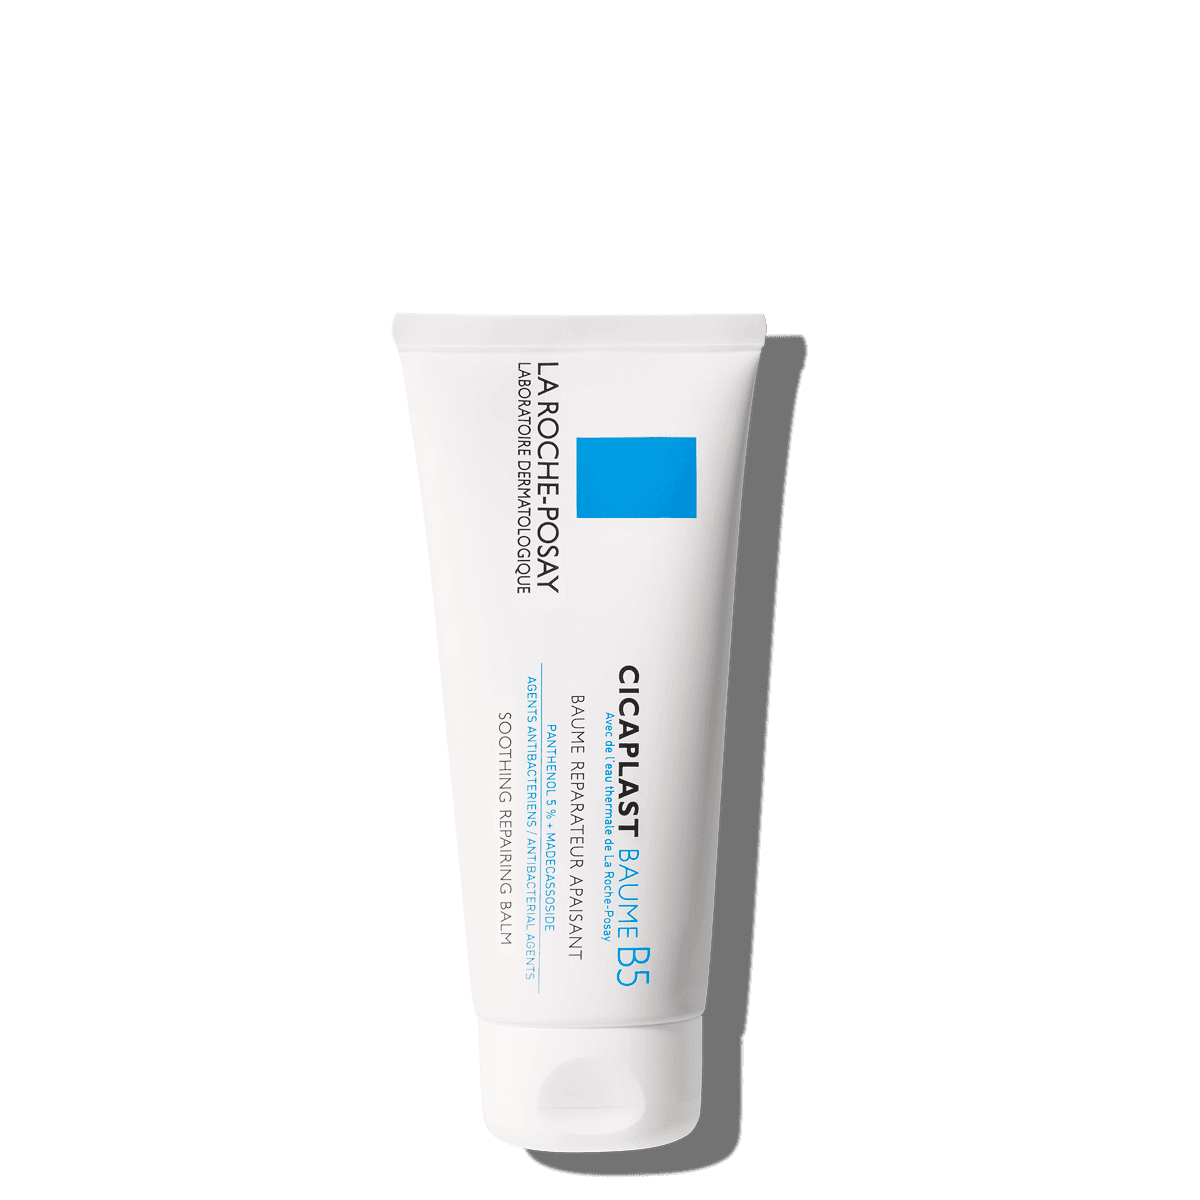 La Roche Posay ProduktSide Skadet Cicaplast Baume B5 100ml 3337872413